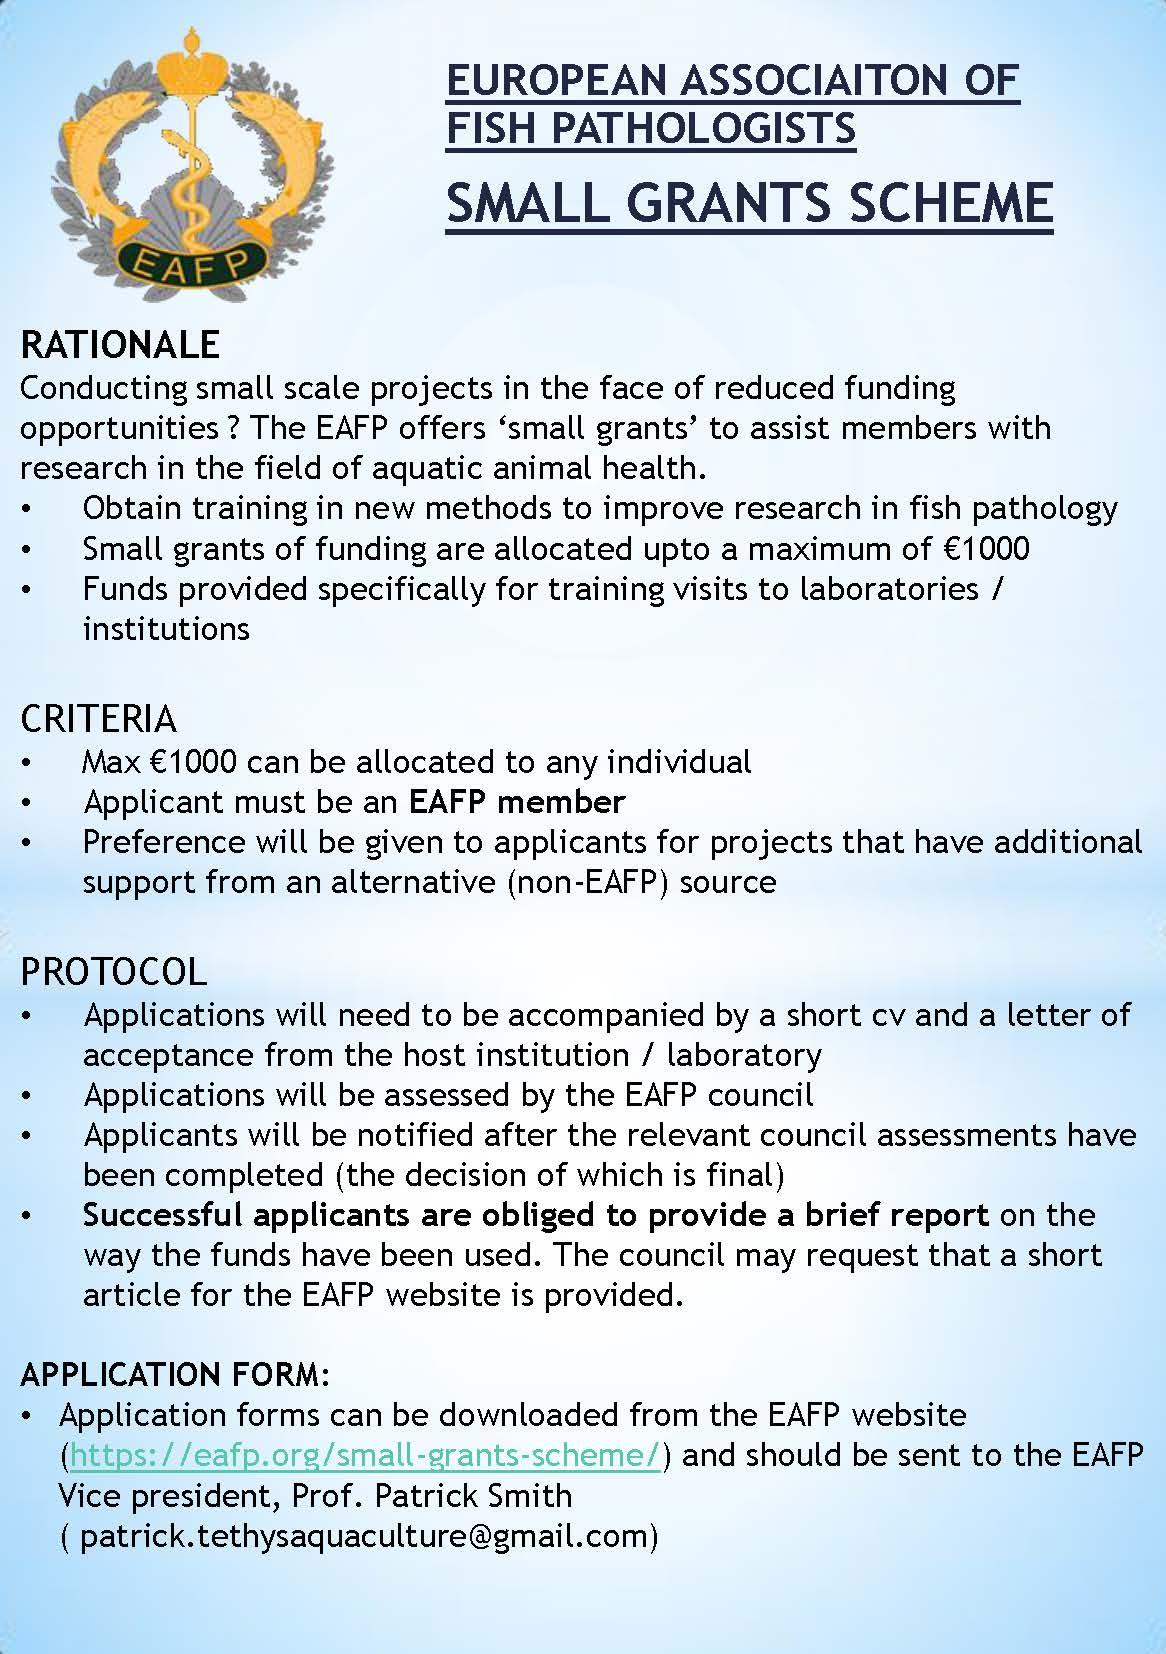 eafp-small-grants-scheme-flyer